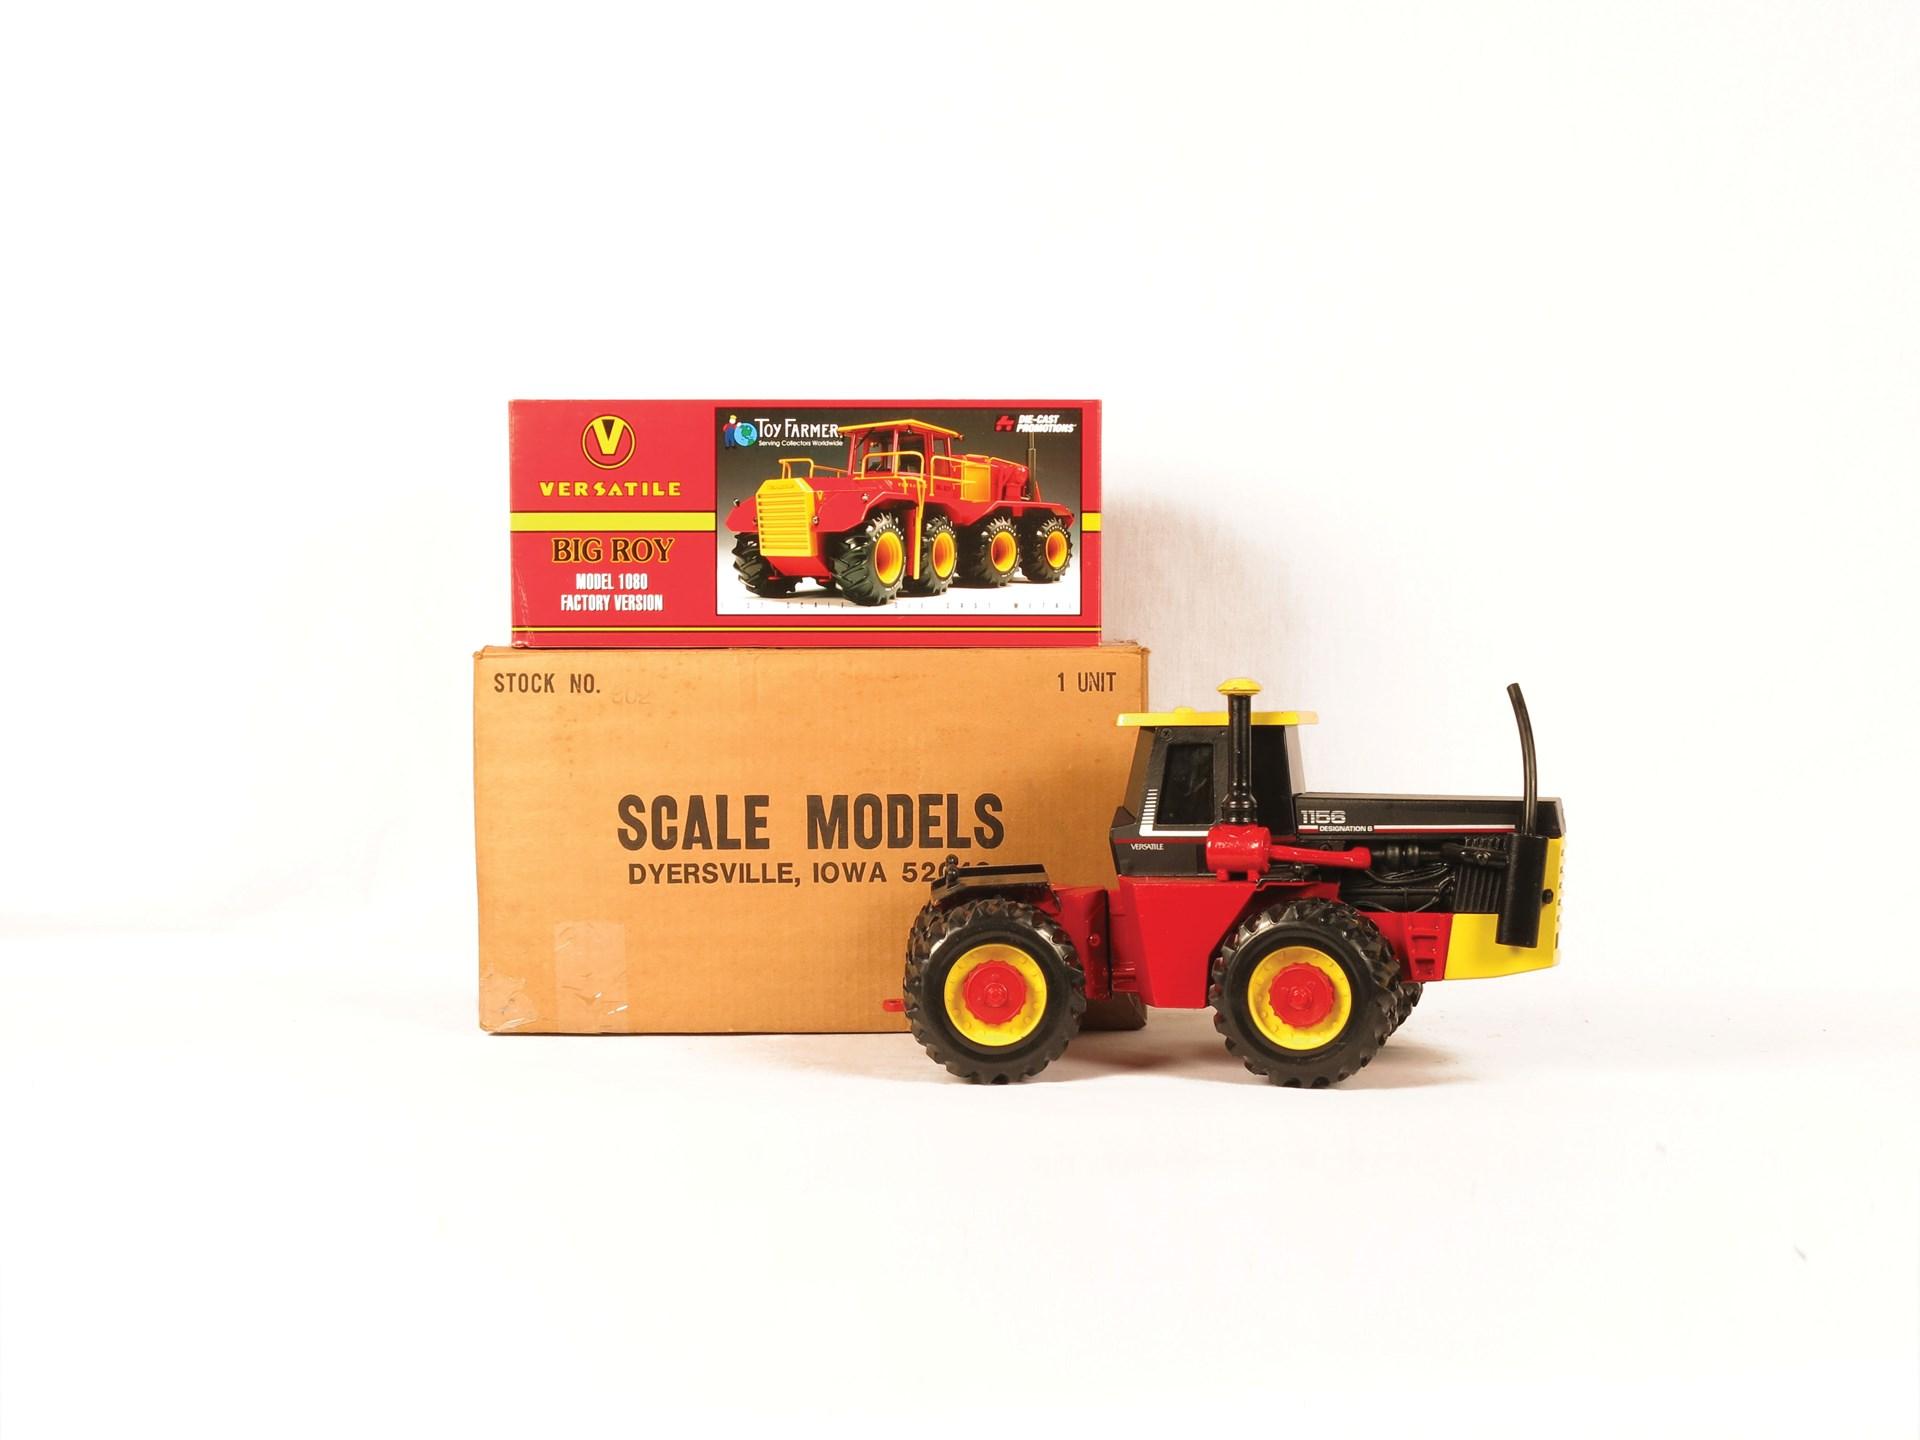 RM Sotheby's - Two Versatile Die-Cast Tractors | Auburn Memorabilia